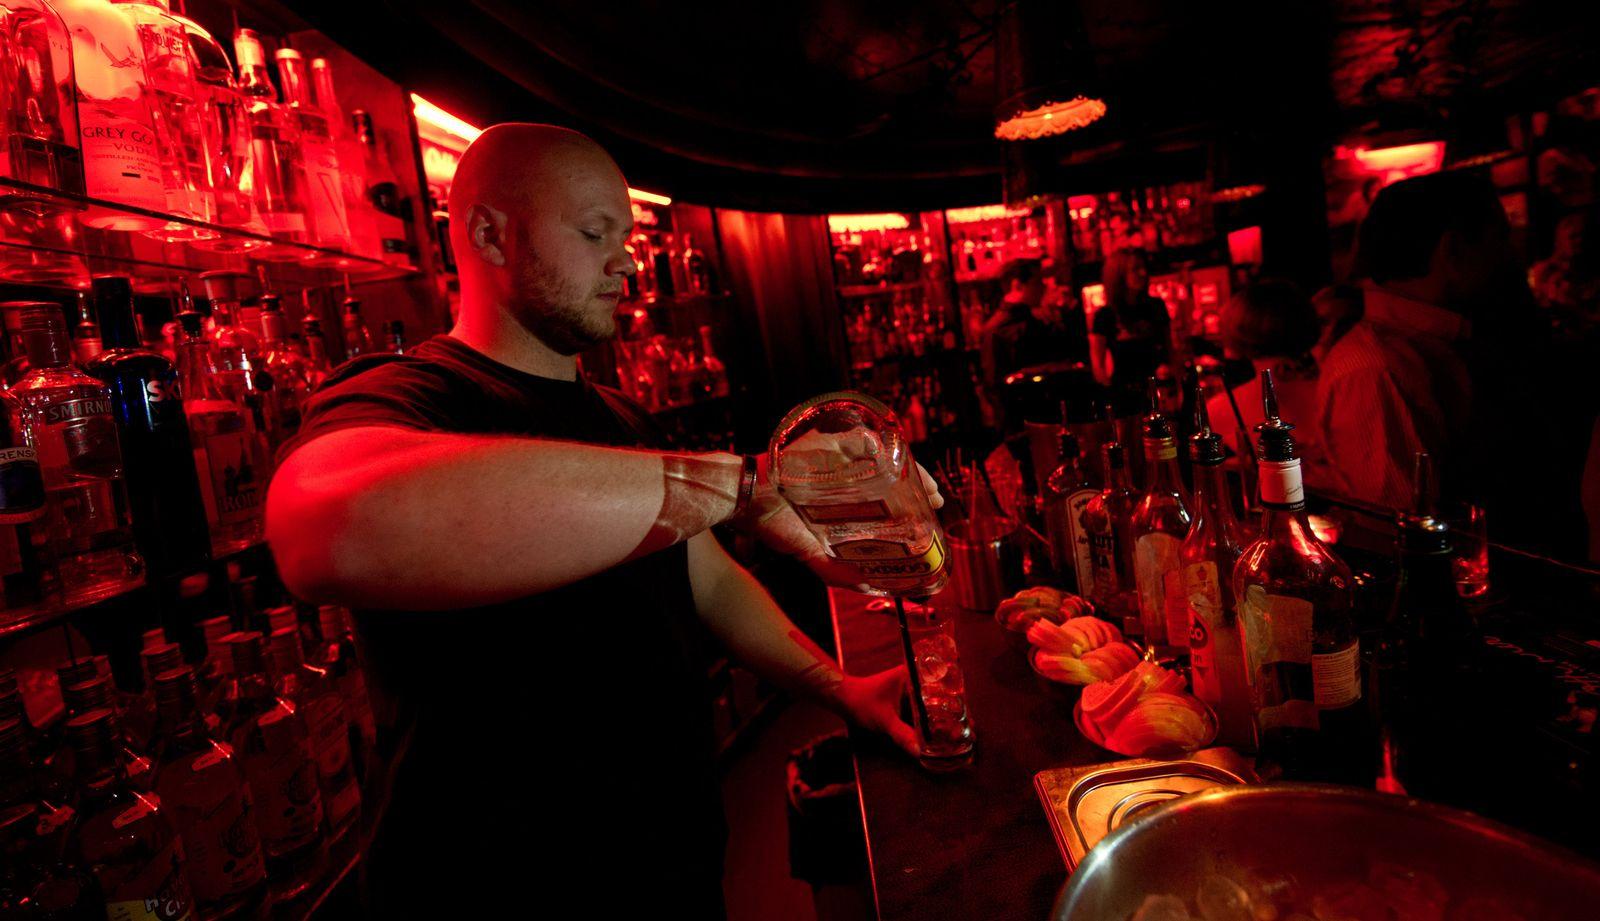 Onkel-Otto-Bar Mannheim